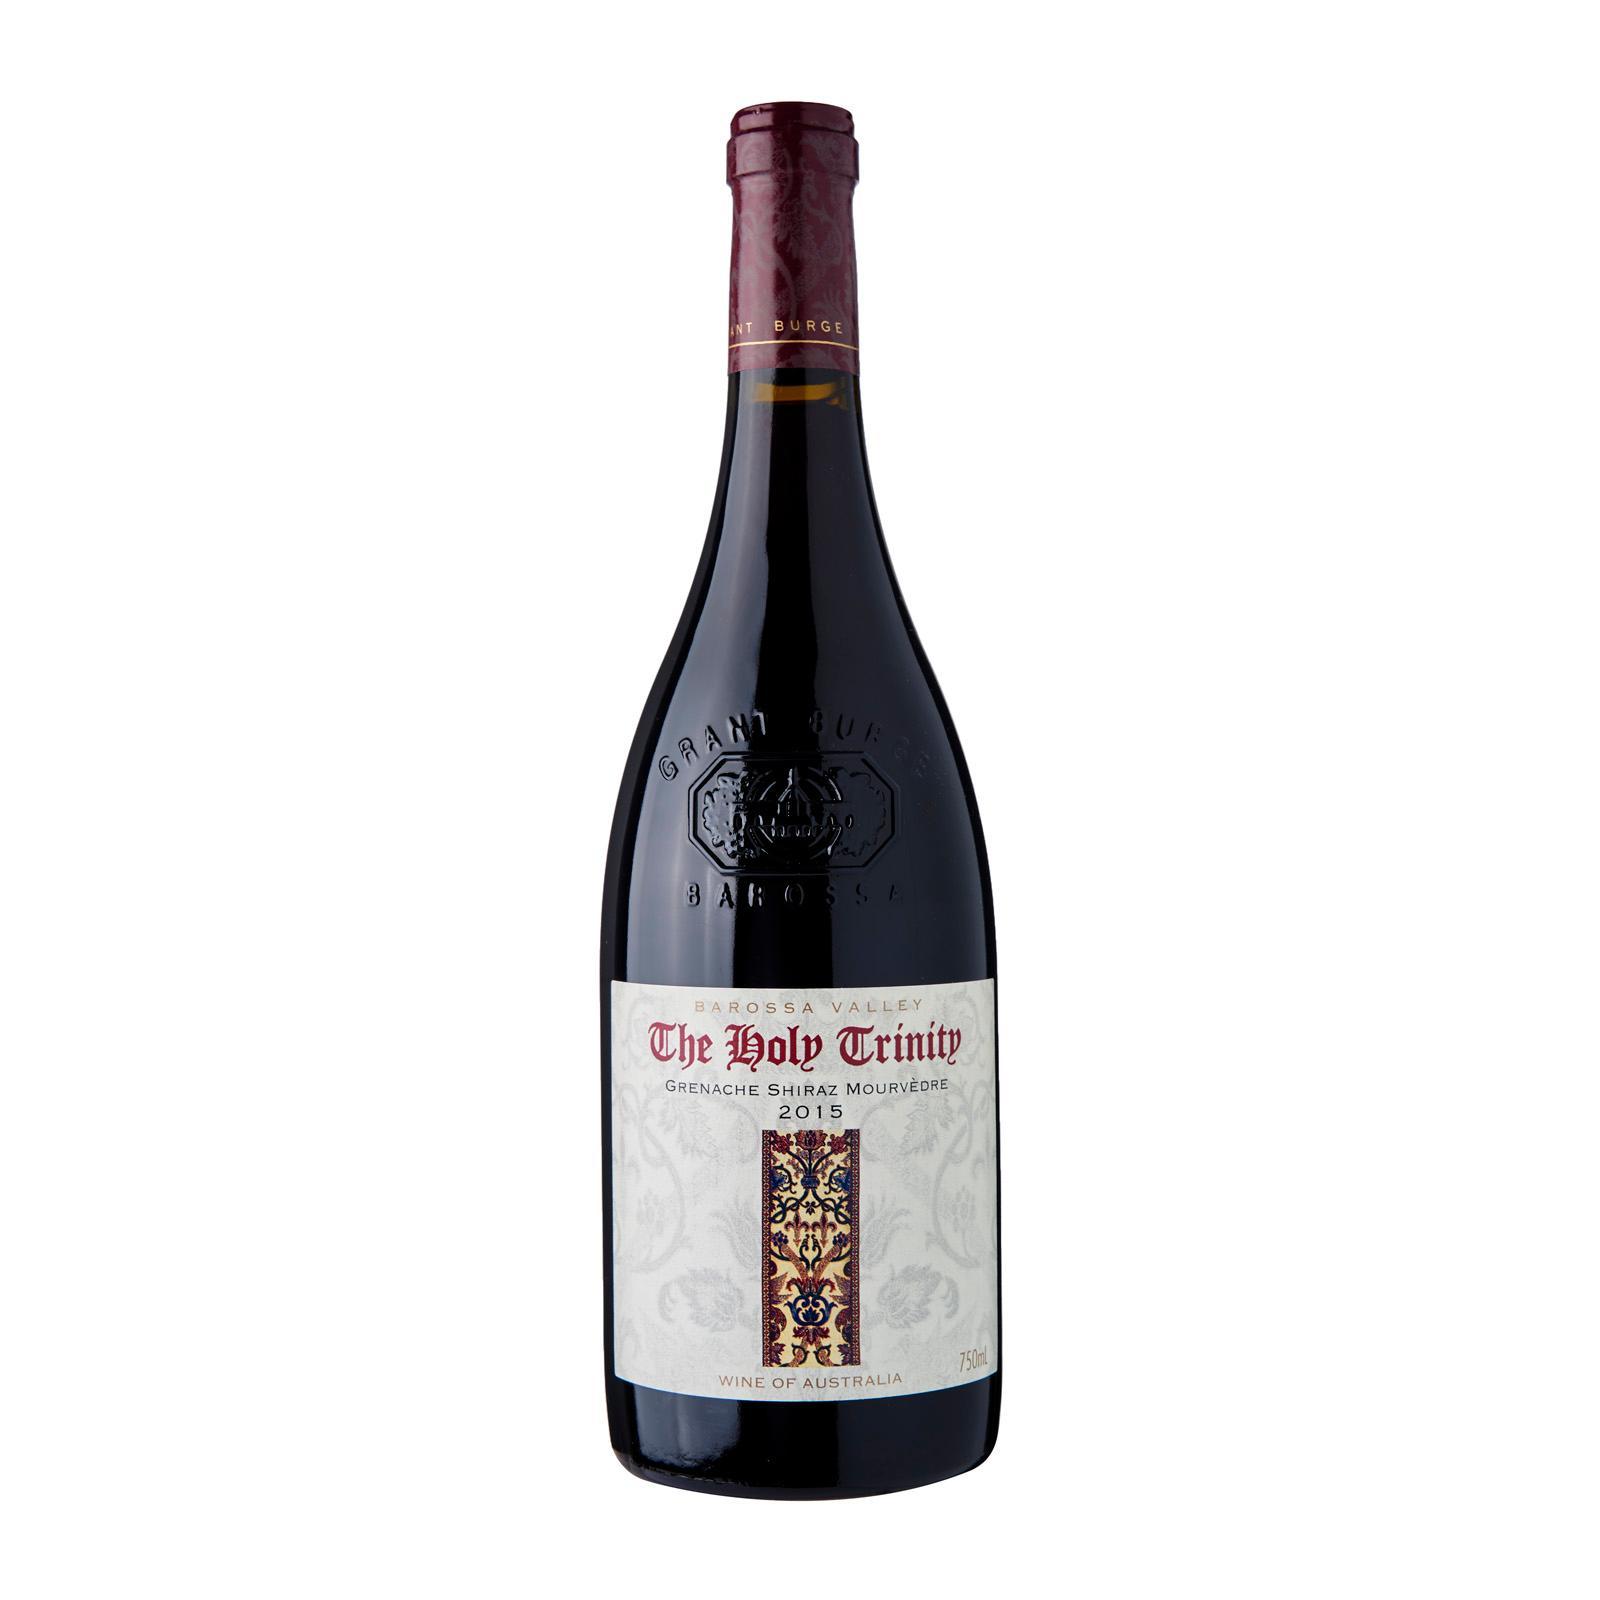 Grant Burge Wines of Distinction The Holy Trinity Grenache Shiraz Mourvedre